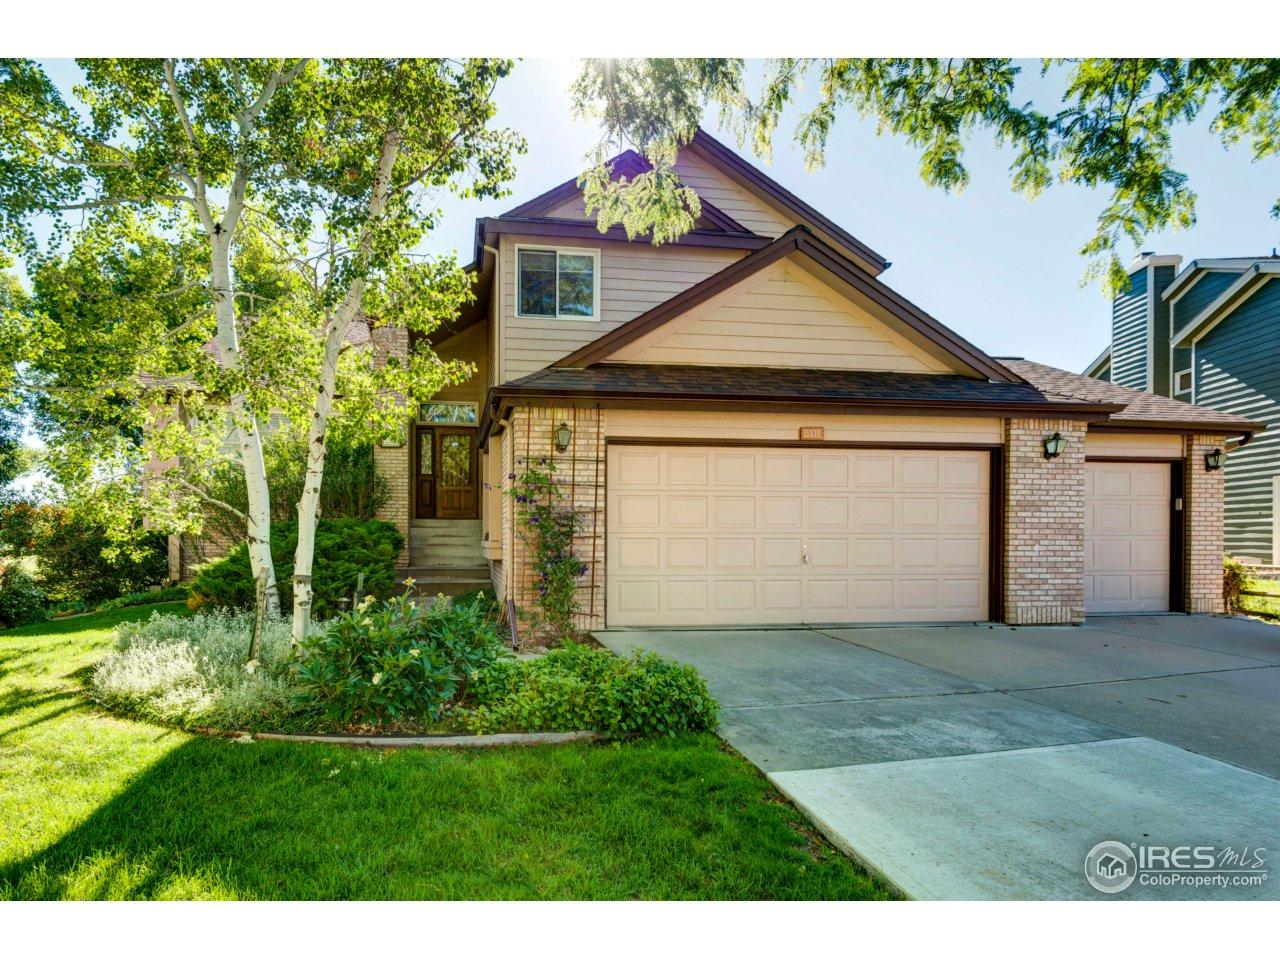 5308 Castle Pines Ct, Fort Collins, CO 80525